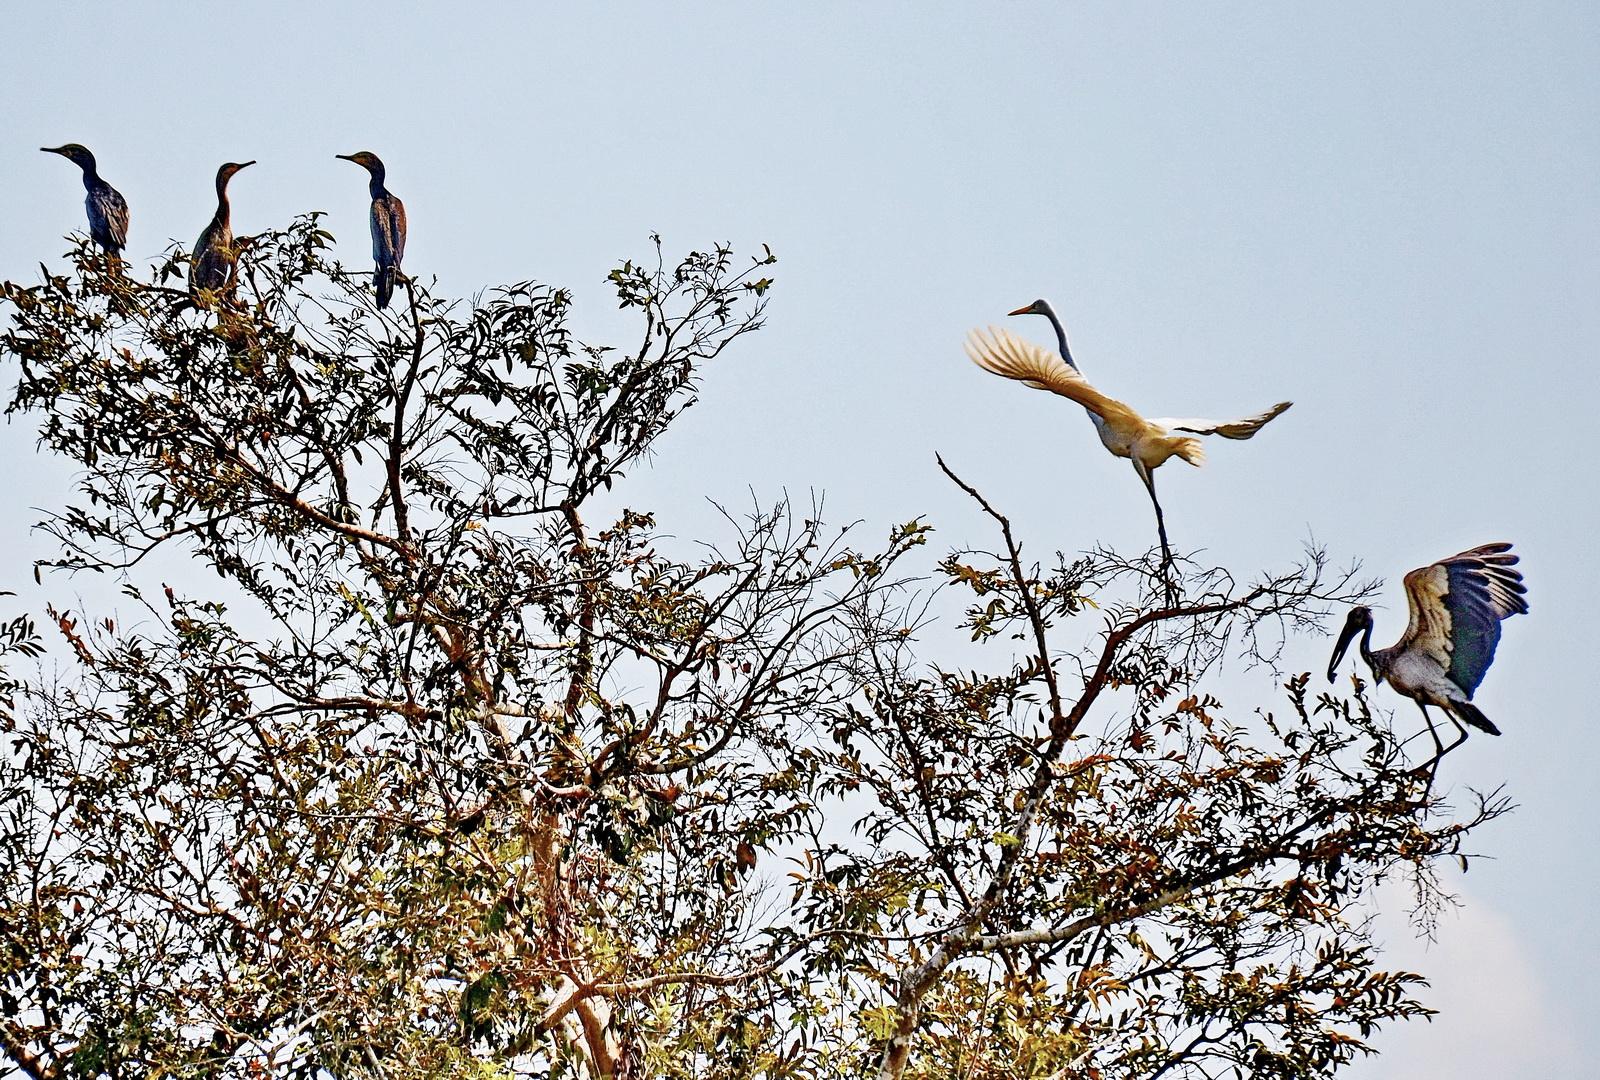 Birdlife on the Mongkol Borei River